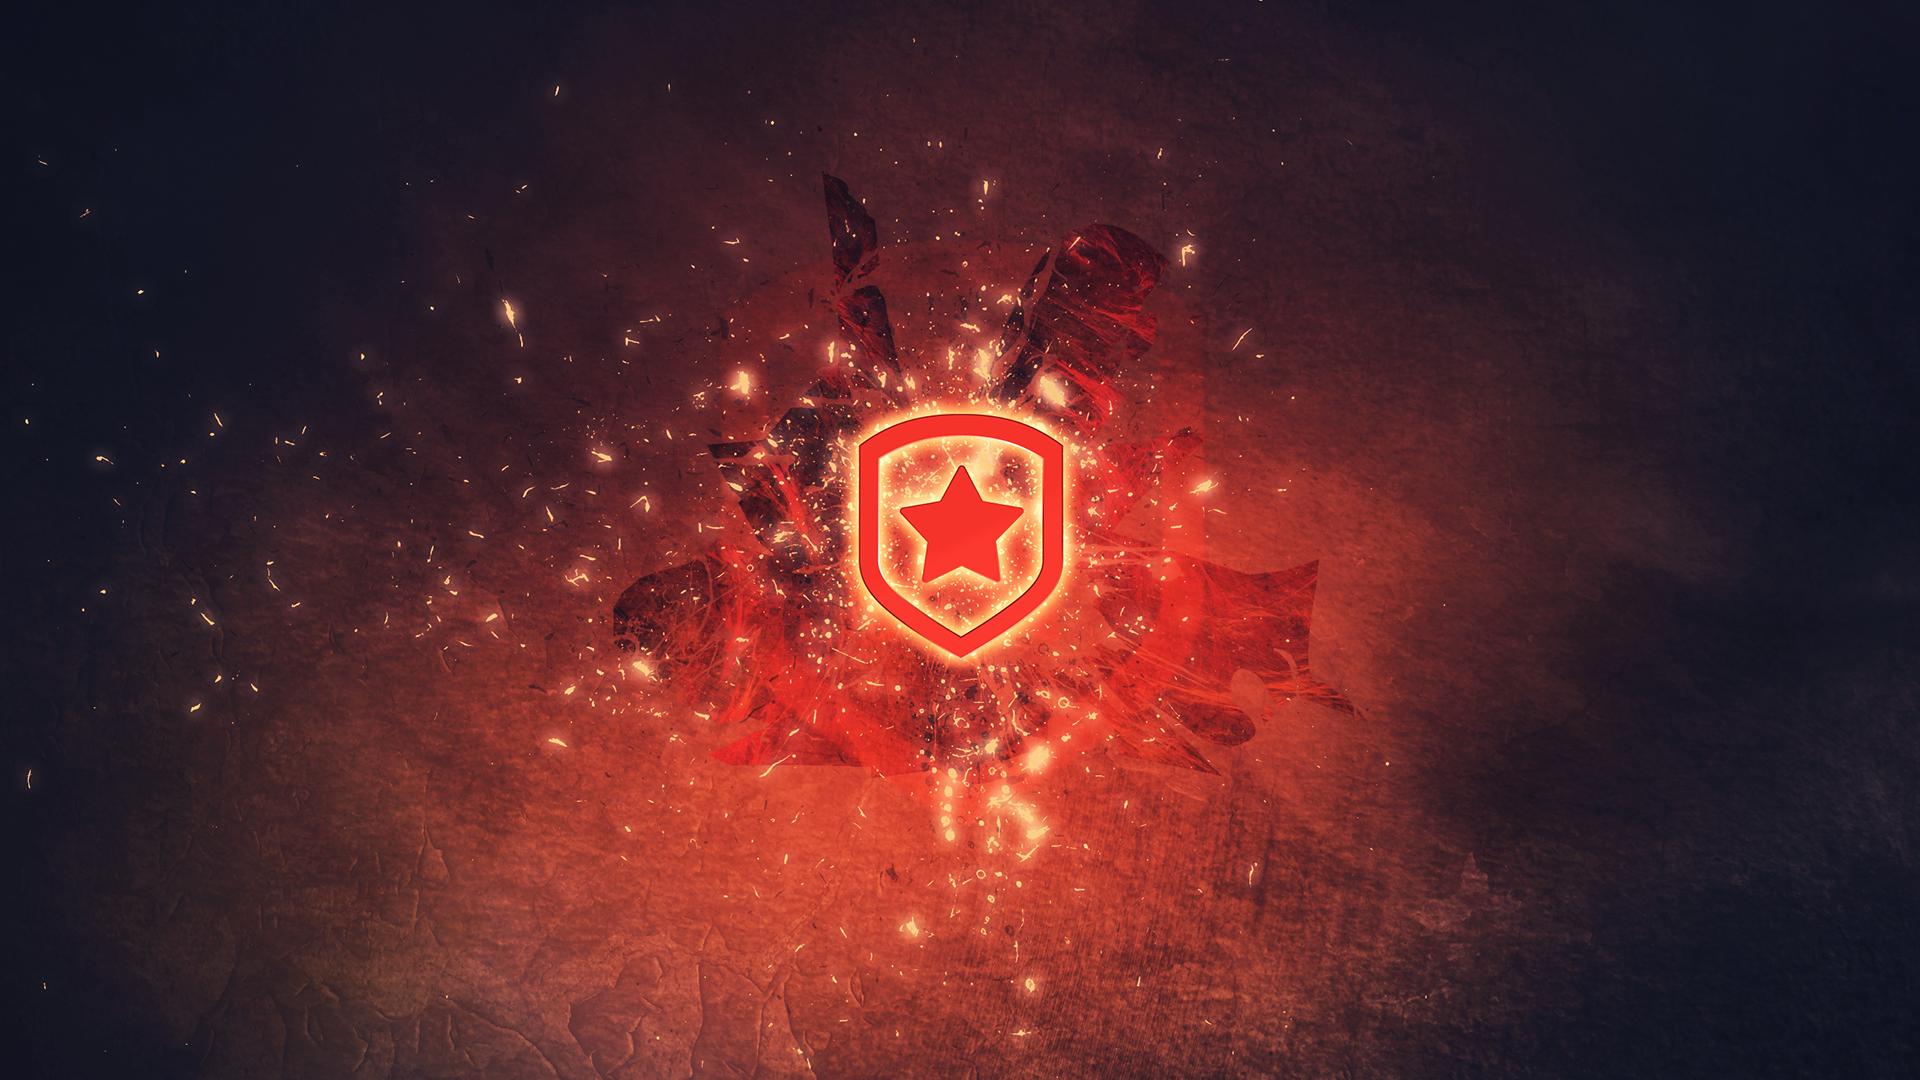 gambit guardians wallpaper 1920x1080 - photo #16